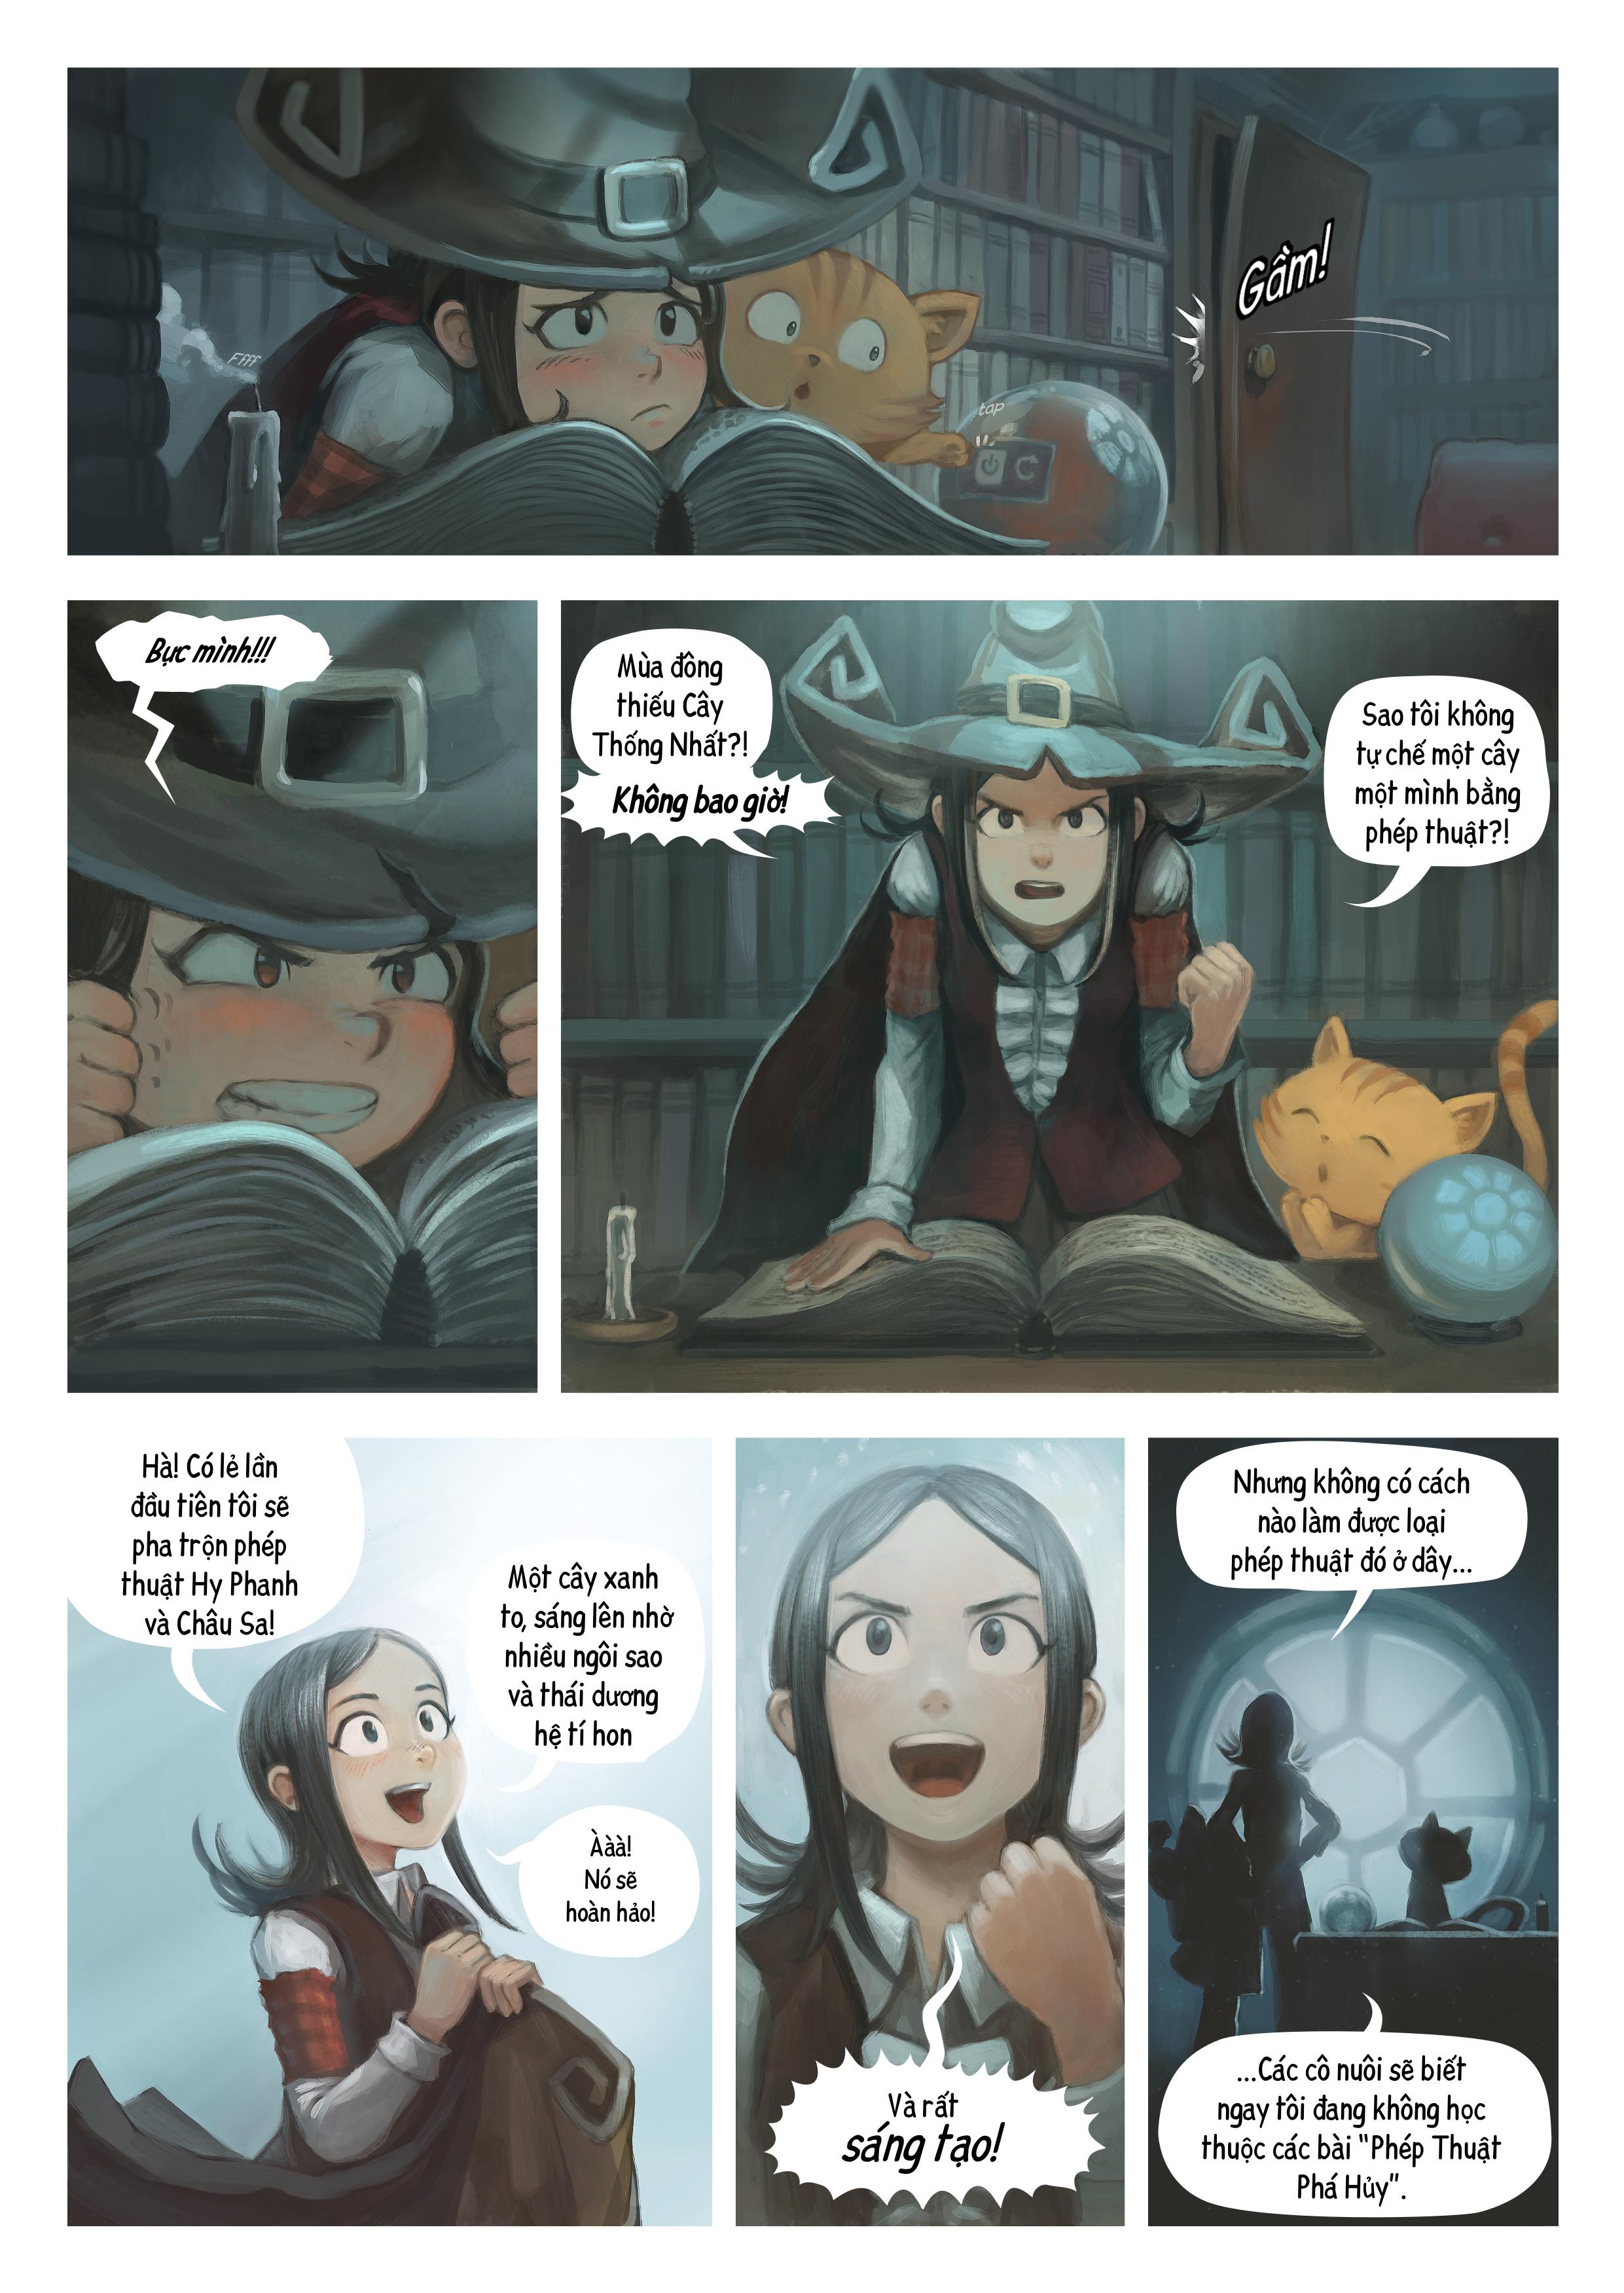 A webcomic page of Pepper&Carrot, Tập 24 [vi], trang 2